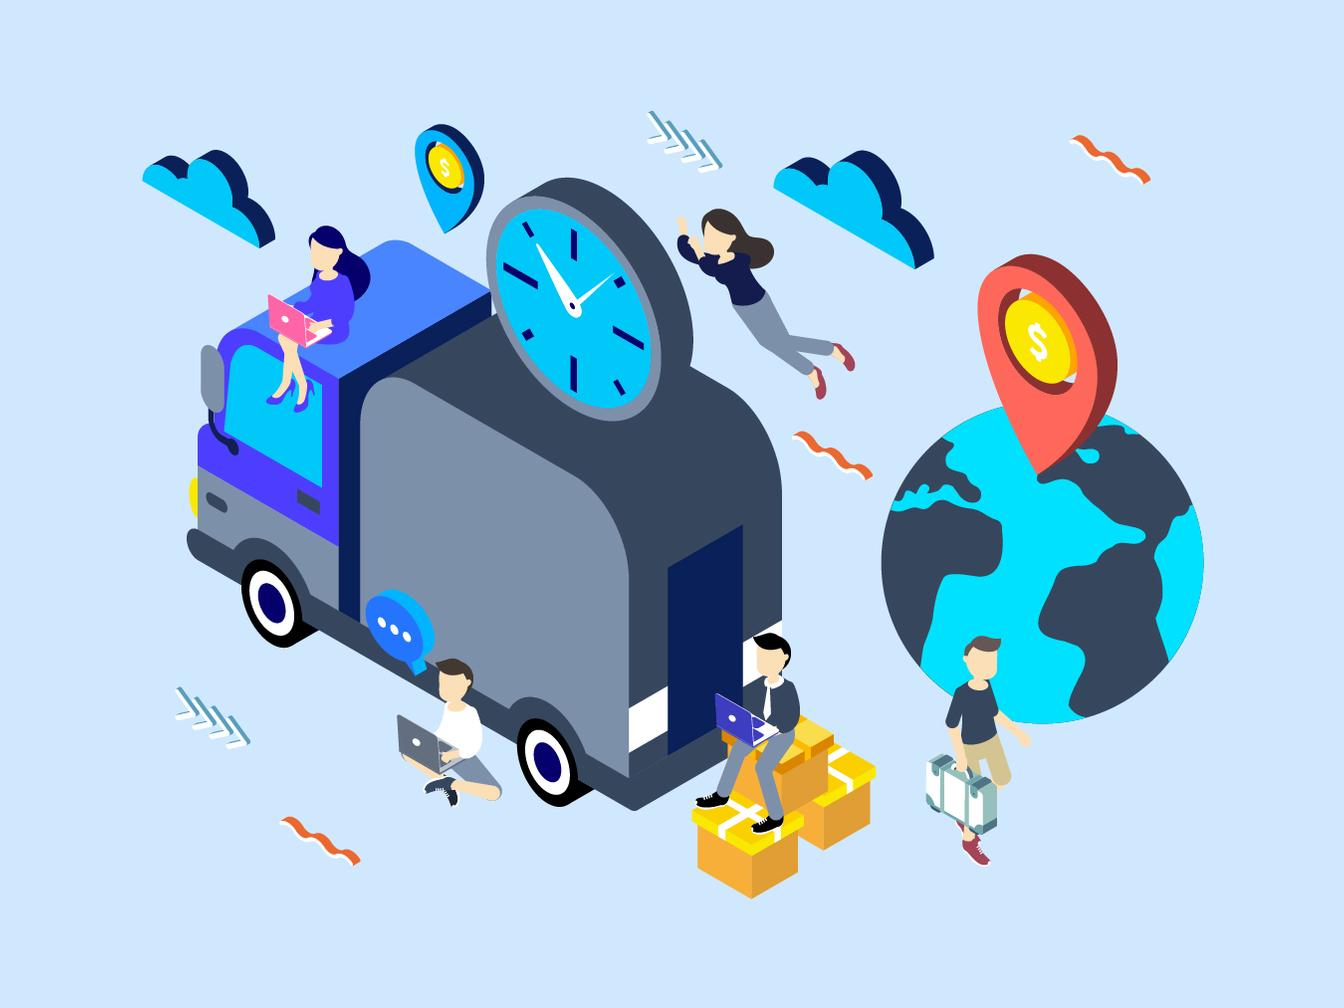 Social Marketing Isometric network css social isometric illustration 3d